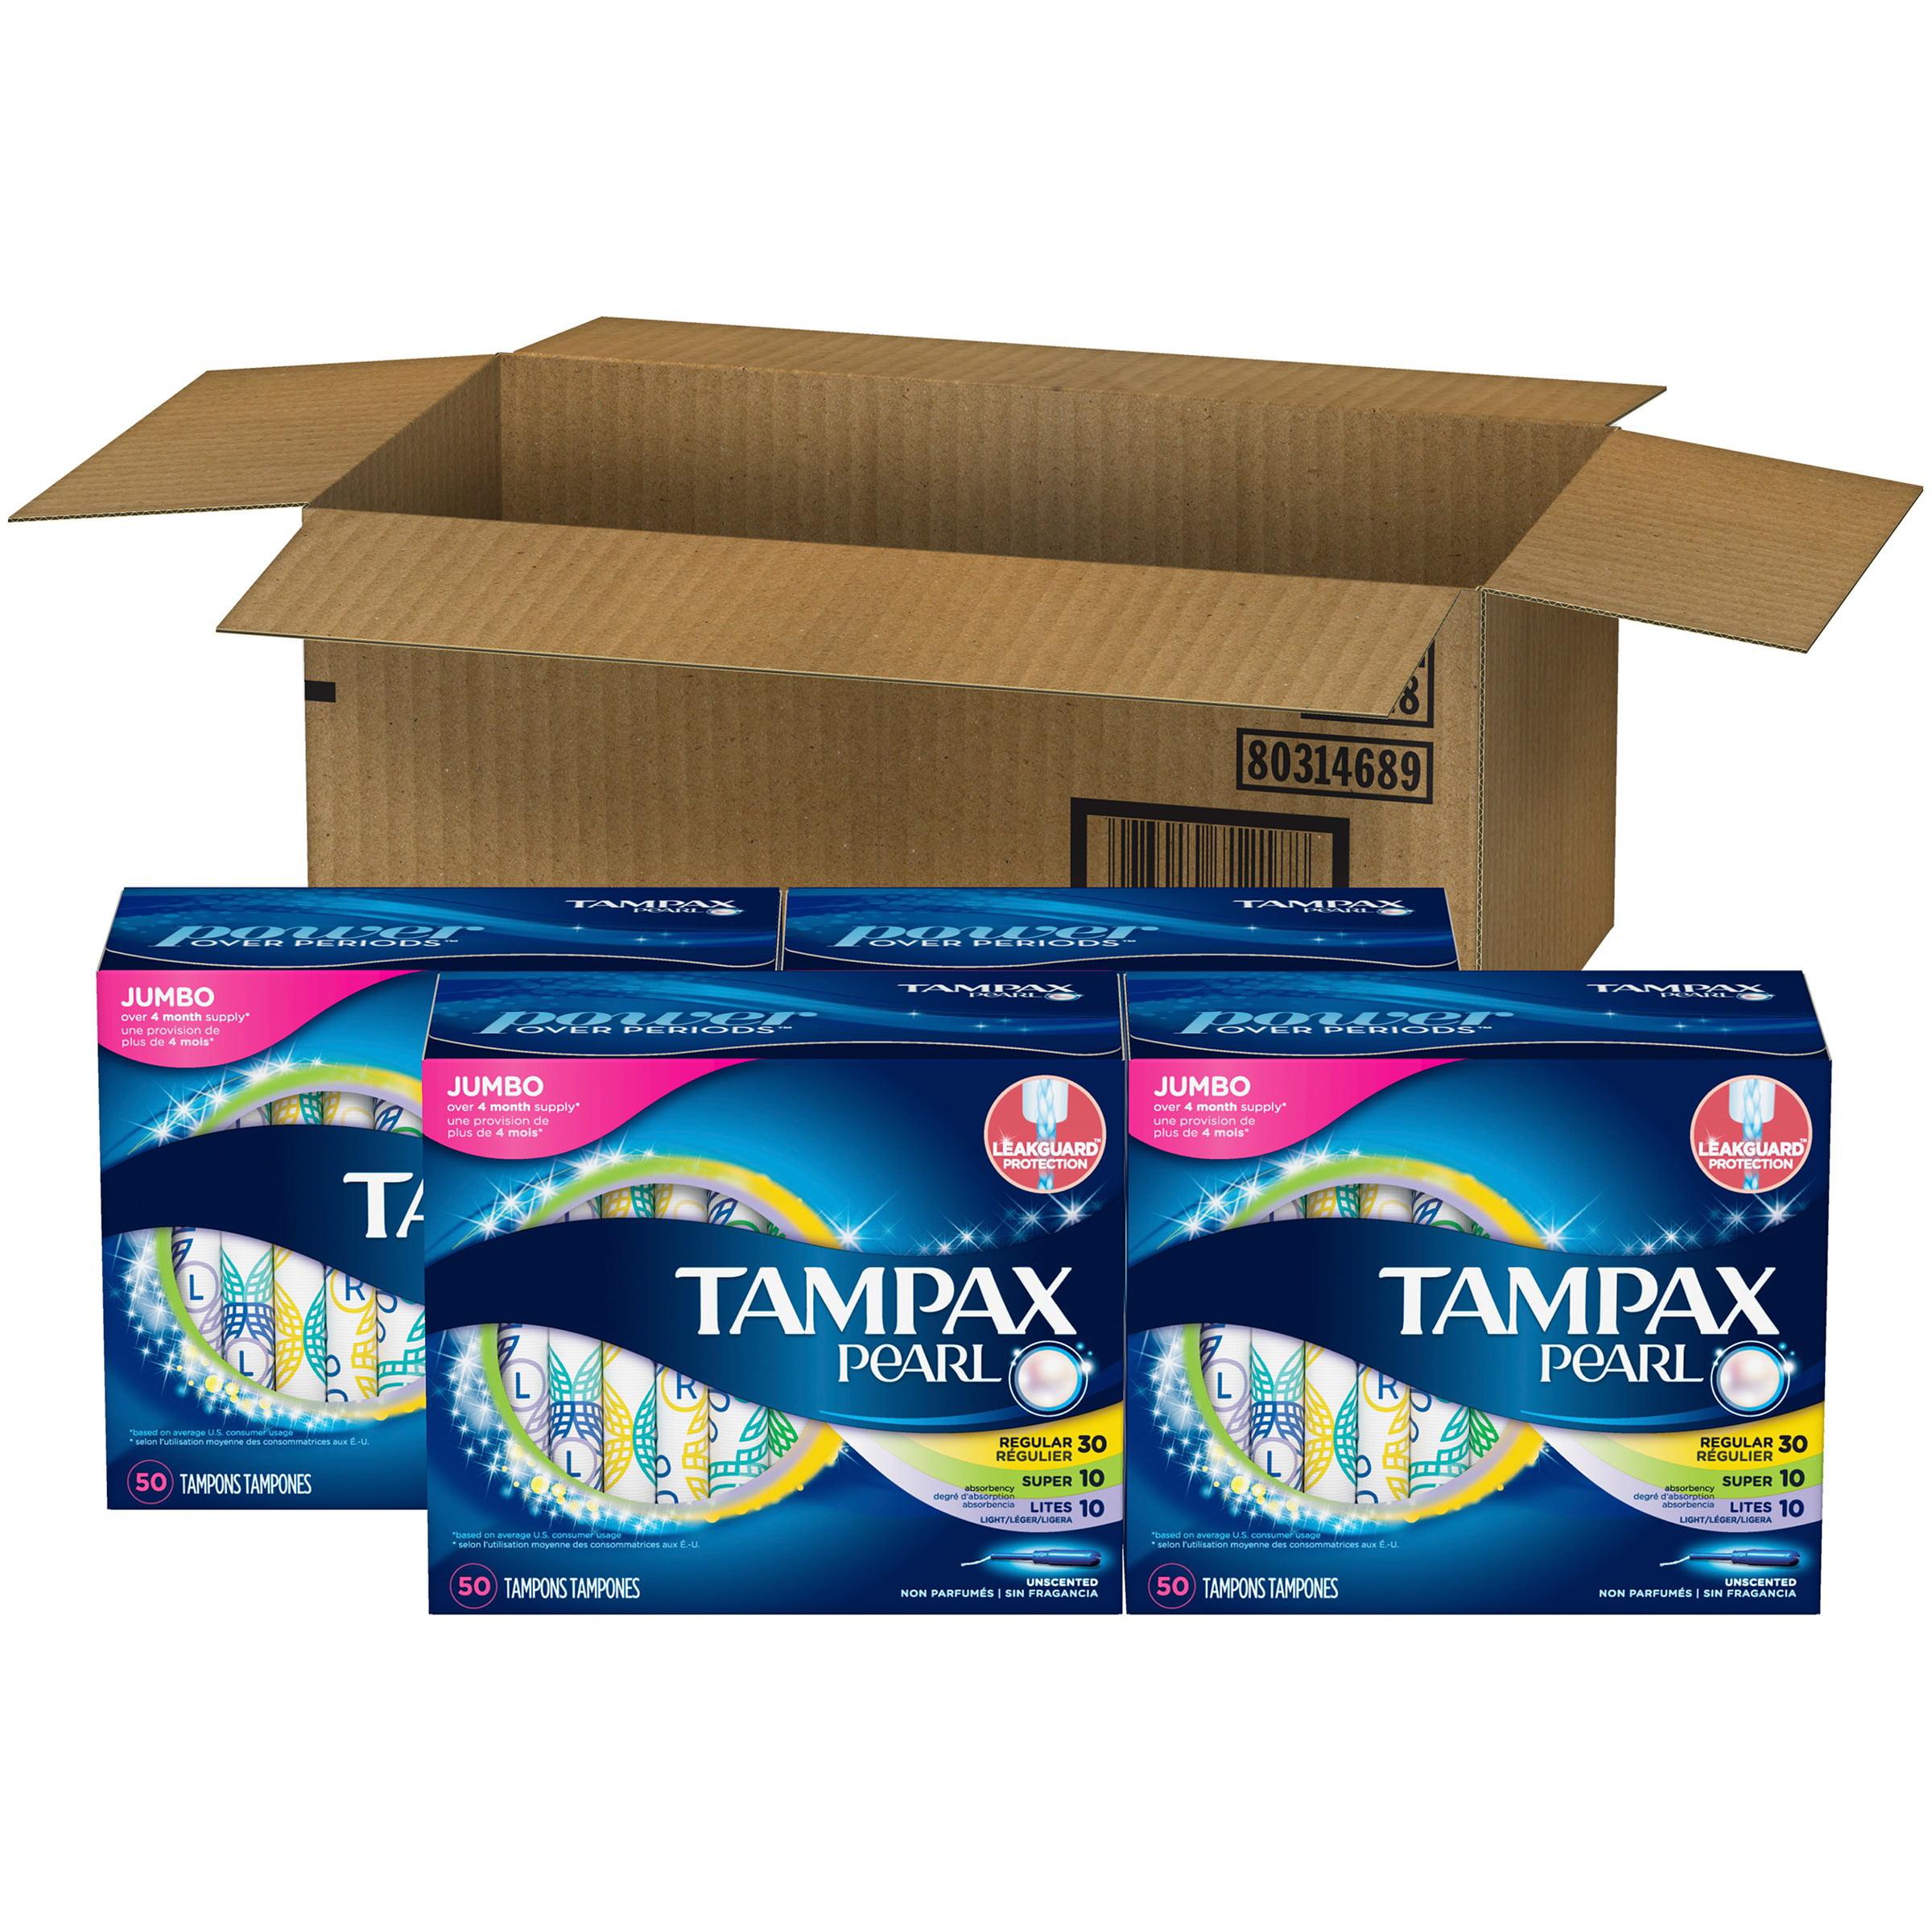 Tampax Pearl Plastic Tampons, Triplepack, (Light/Regular/Super Absorbency), Unscented, 200 Ct